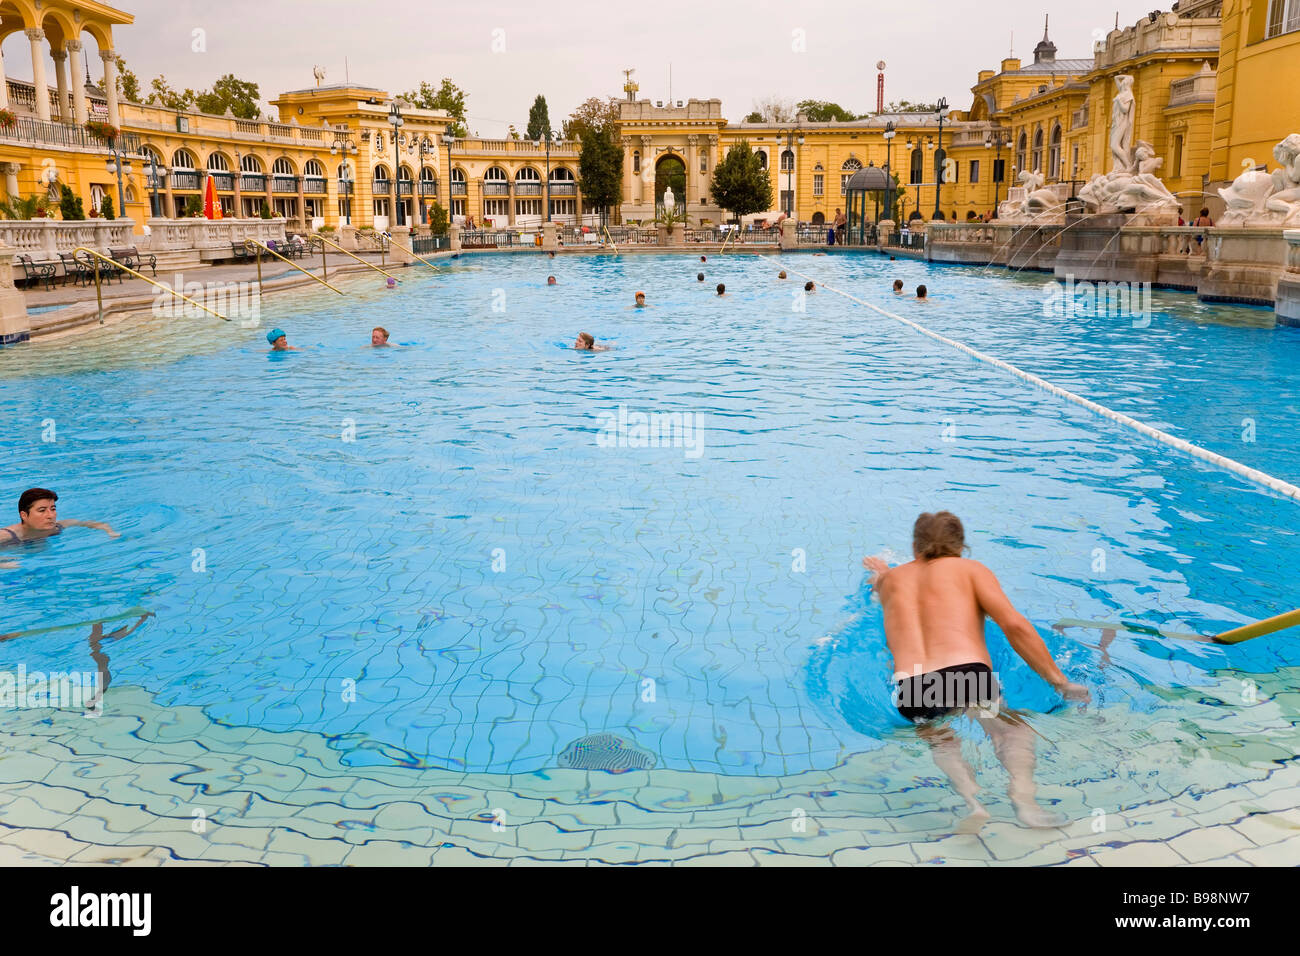 Thermal baths pools Szechenyi Baths Budapest Hungary - Stock Image